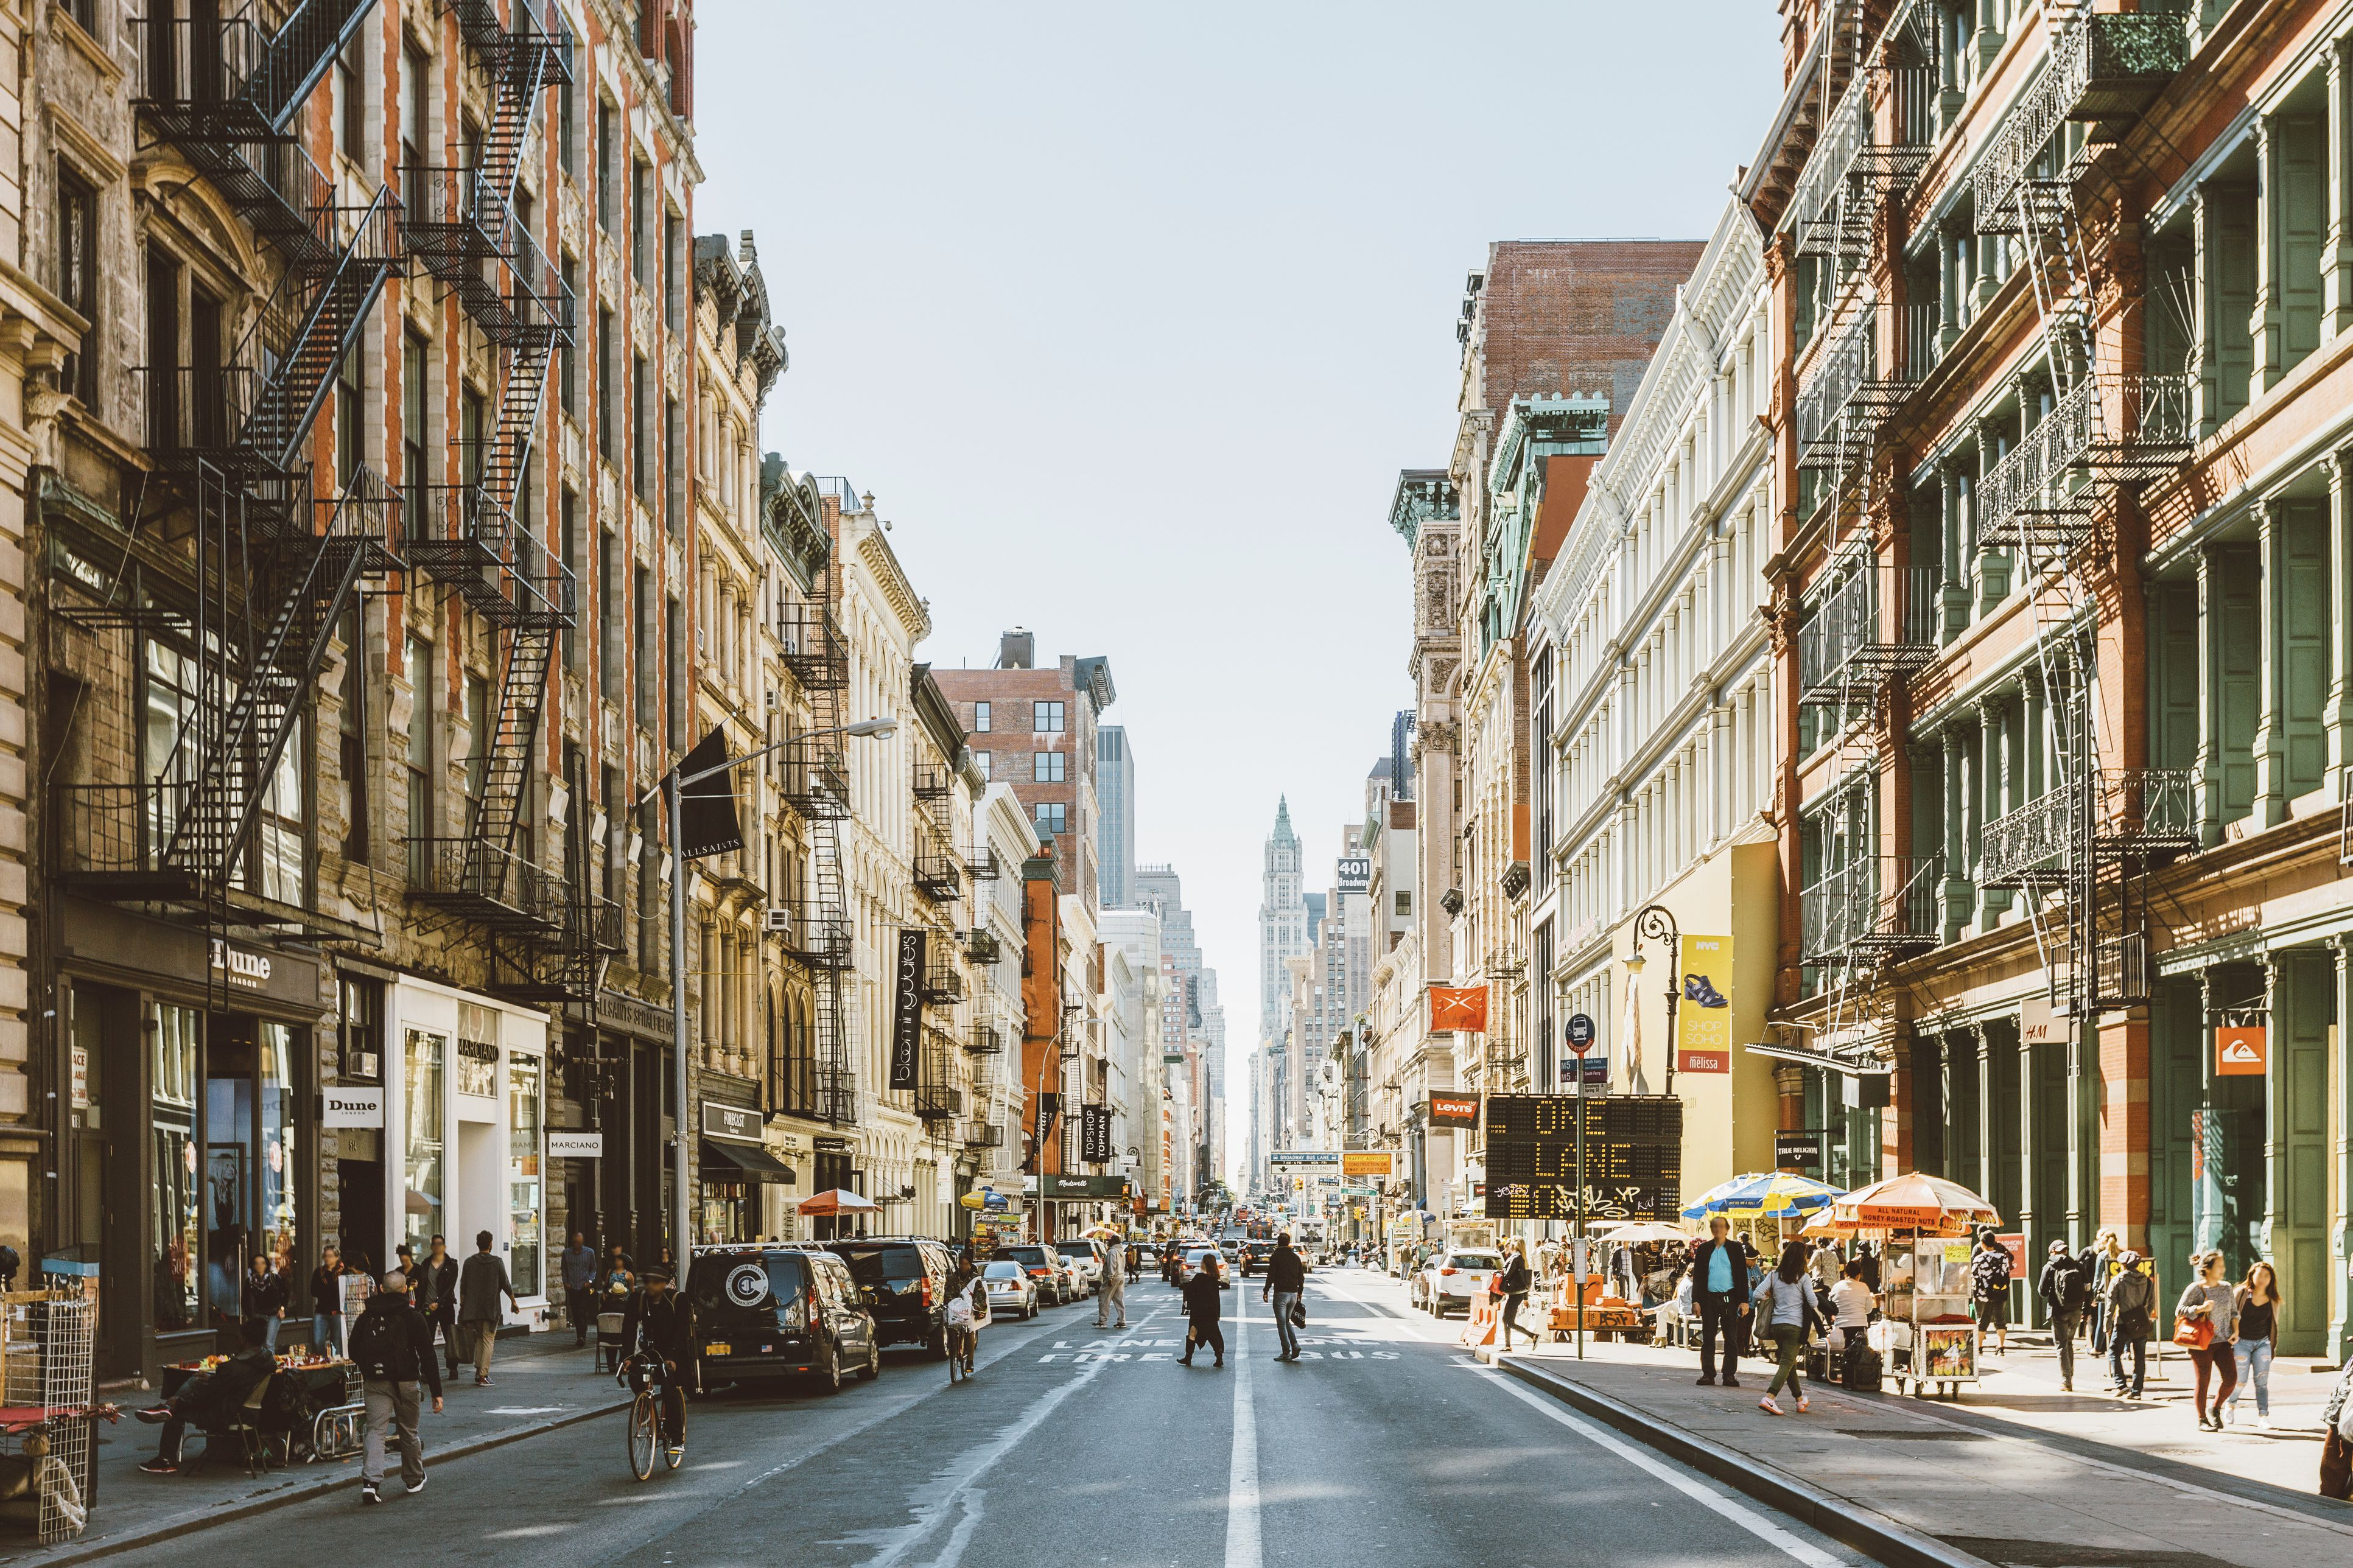 streets-of-soho-new-york-city-usa-520141660-59074a803df78c5456a3440b